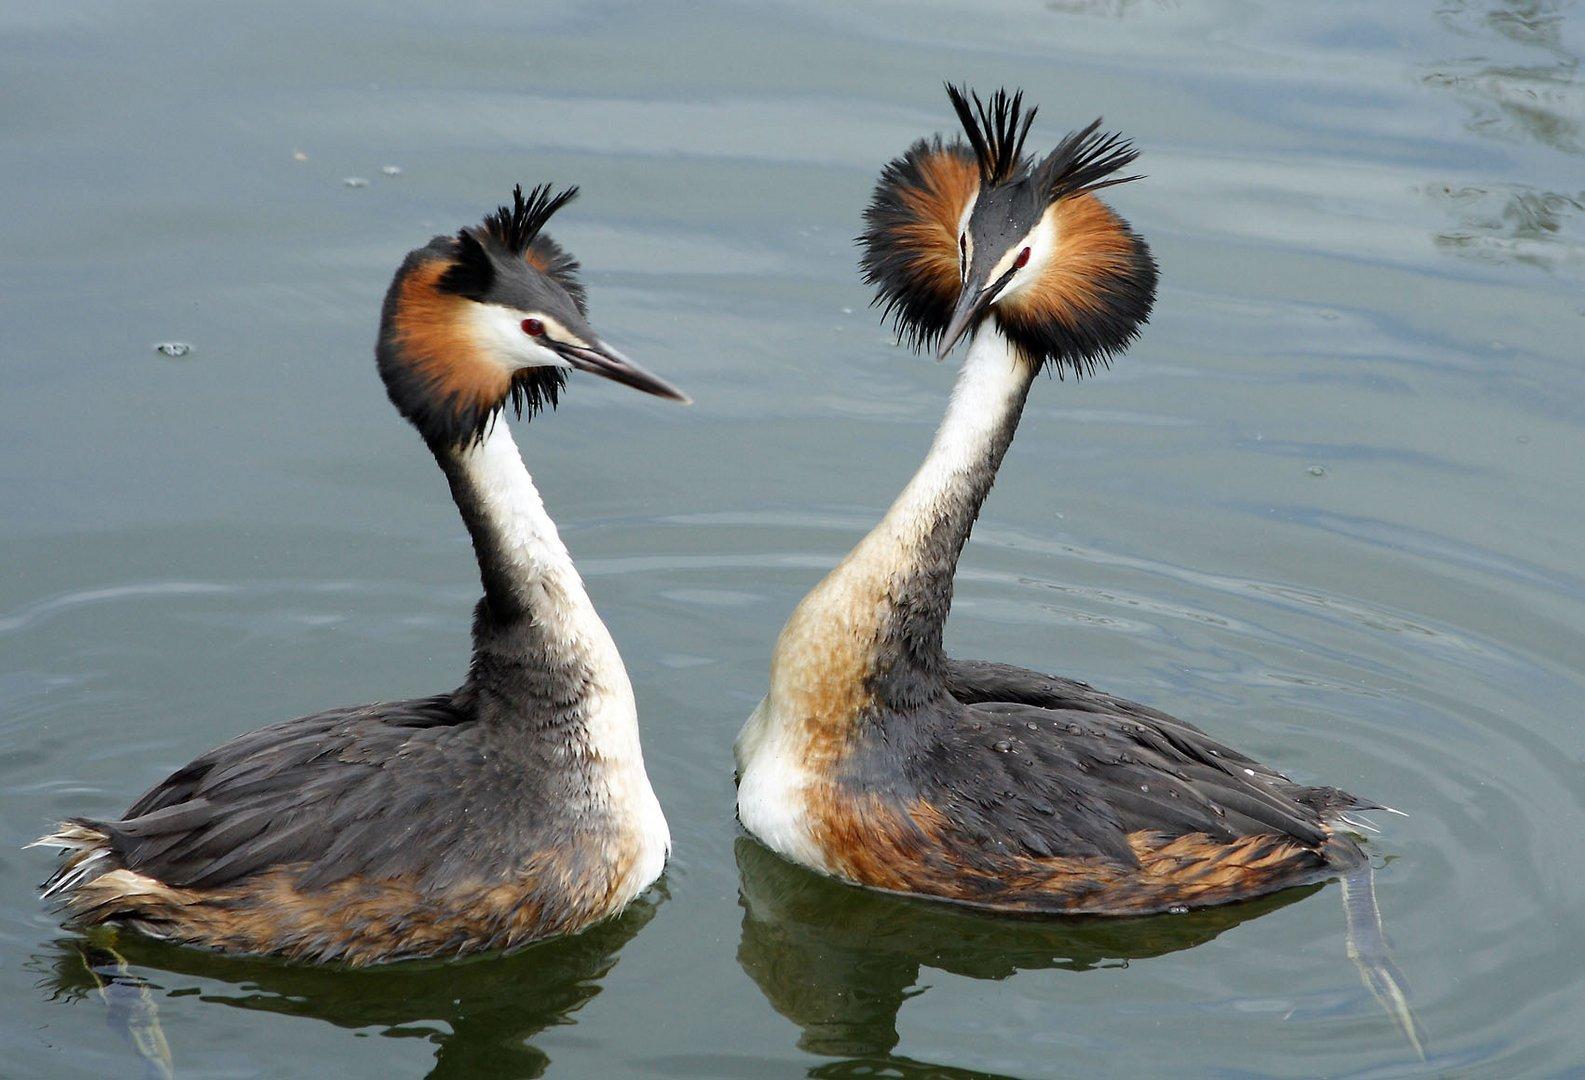 mating season for the grebe